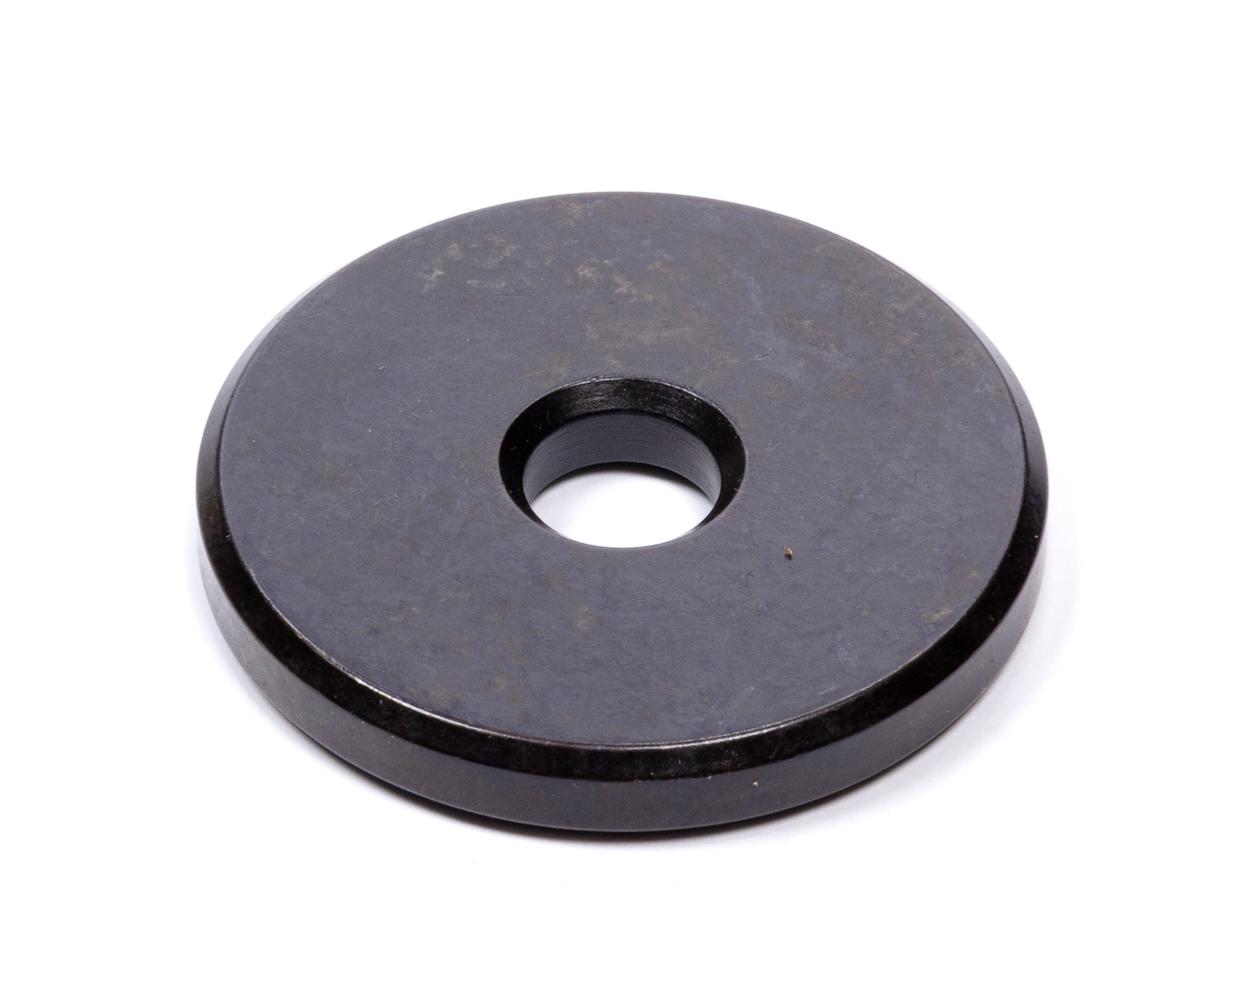 Arp Black Washer - 7/16 ID x 2.000 OD w/Chamfer (1pk)